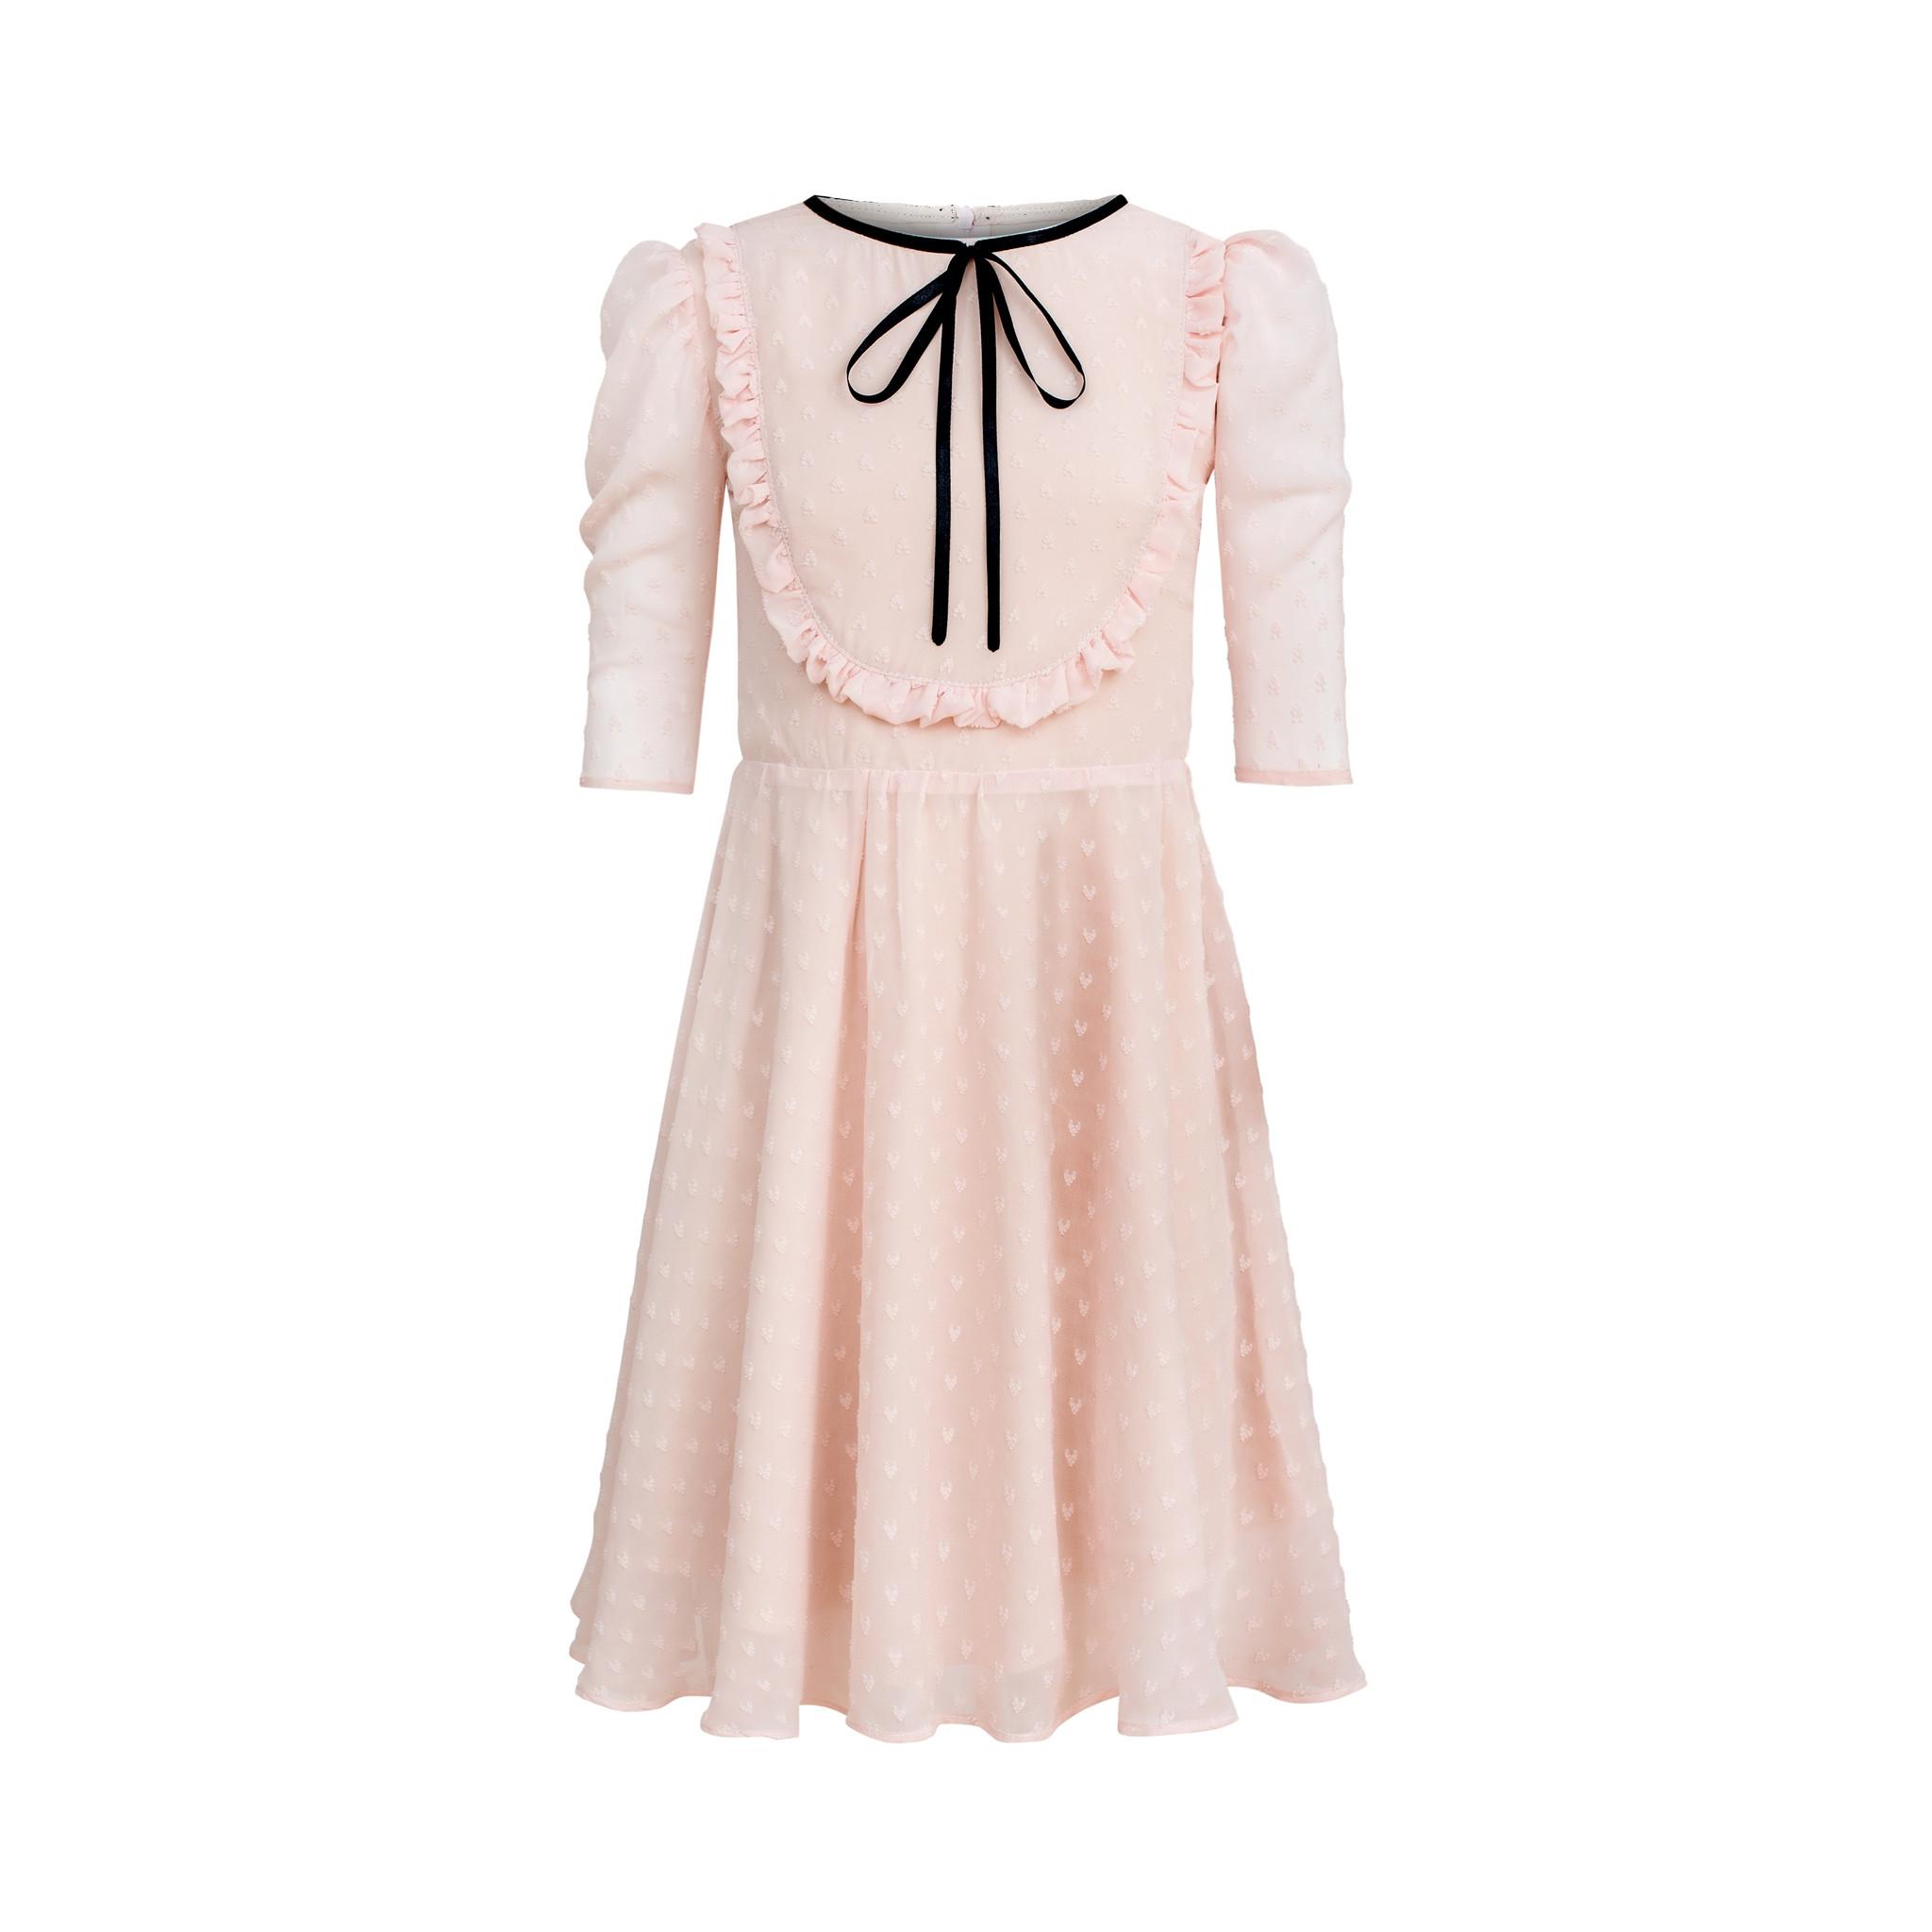 Sukienka pudrowy róż - Domino.little.dress